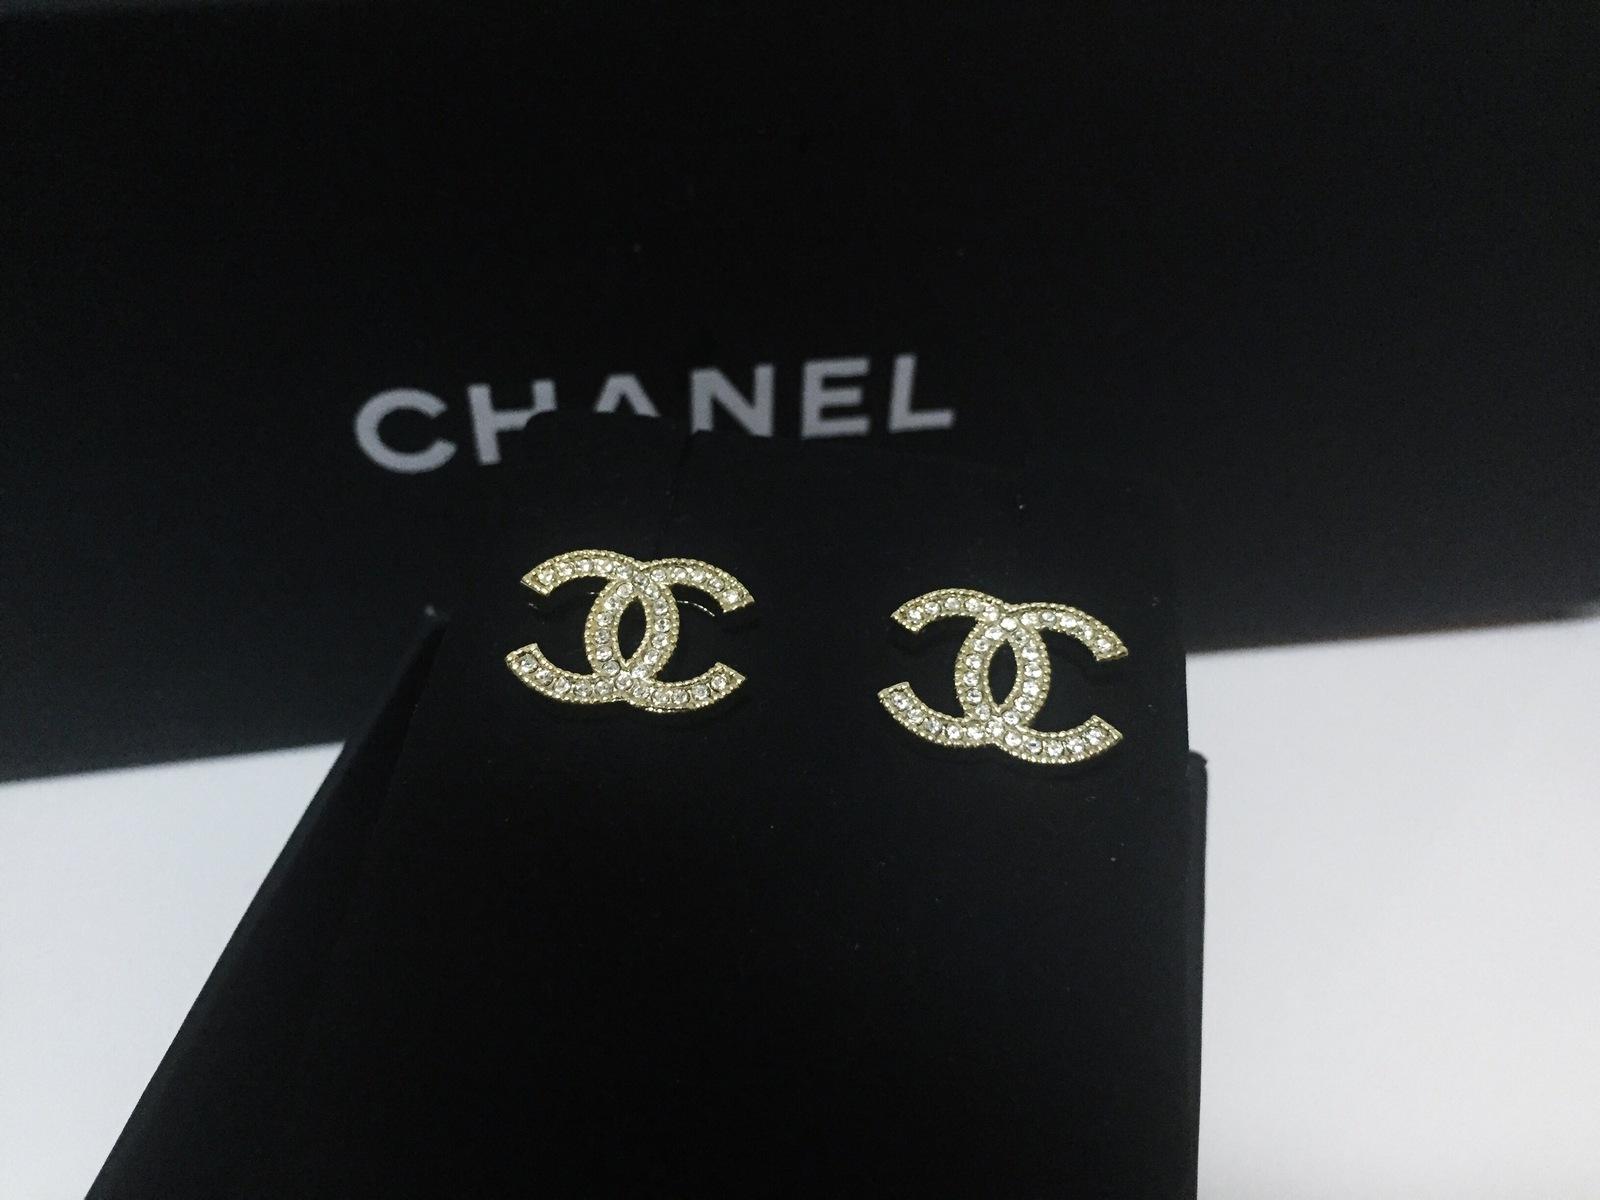 Chanel Diamond Cc Earrings Collection